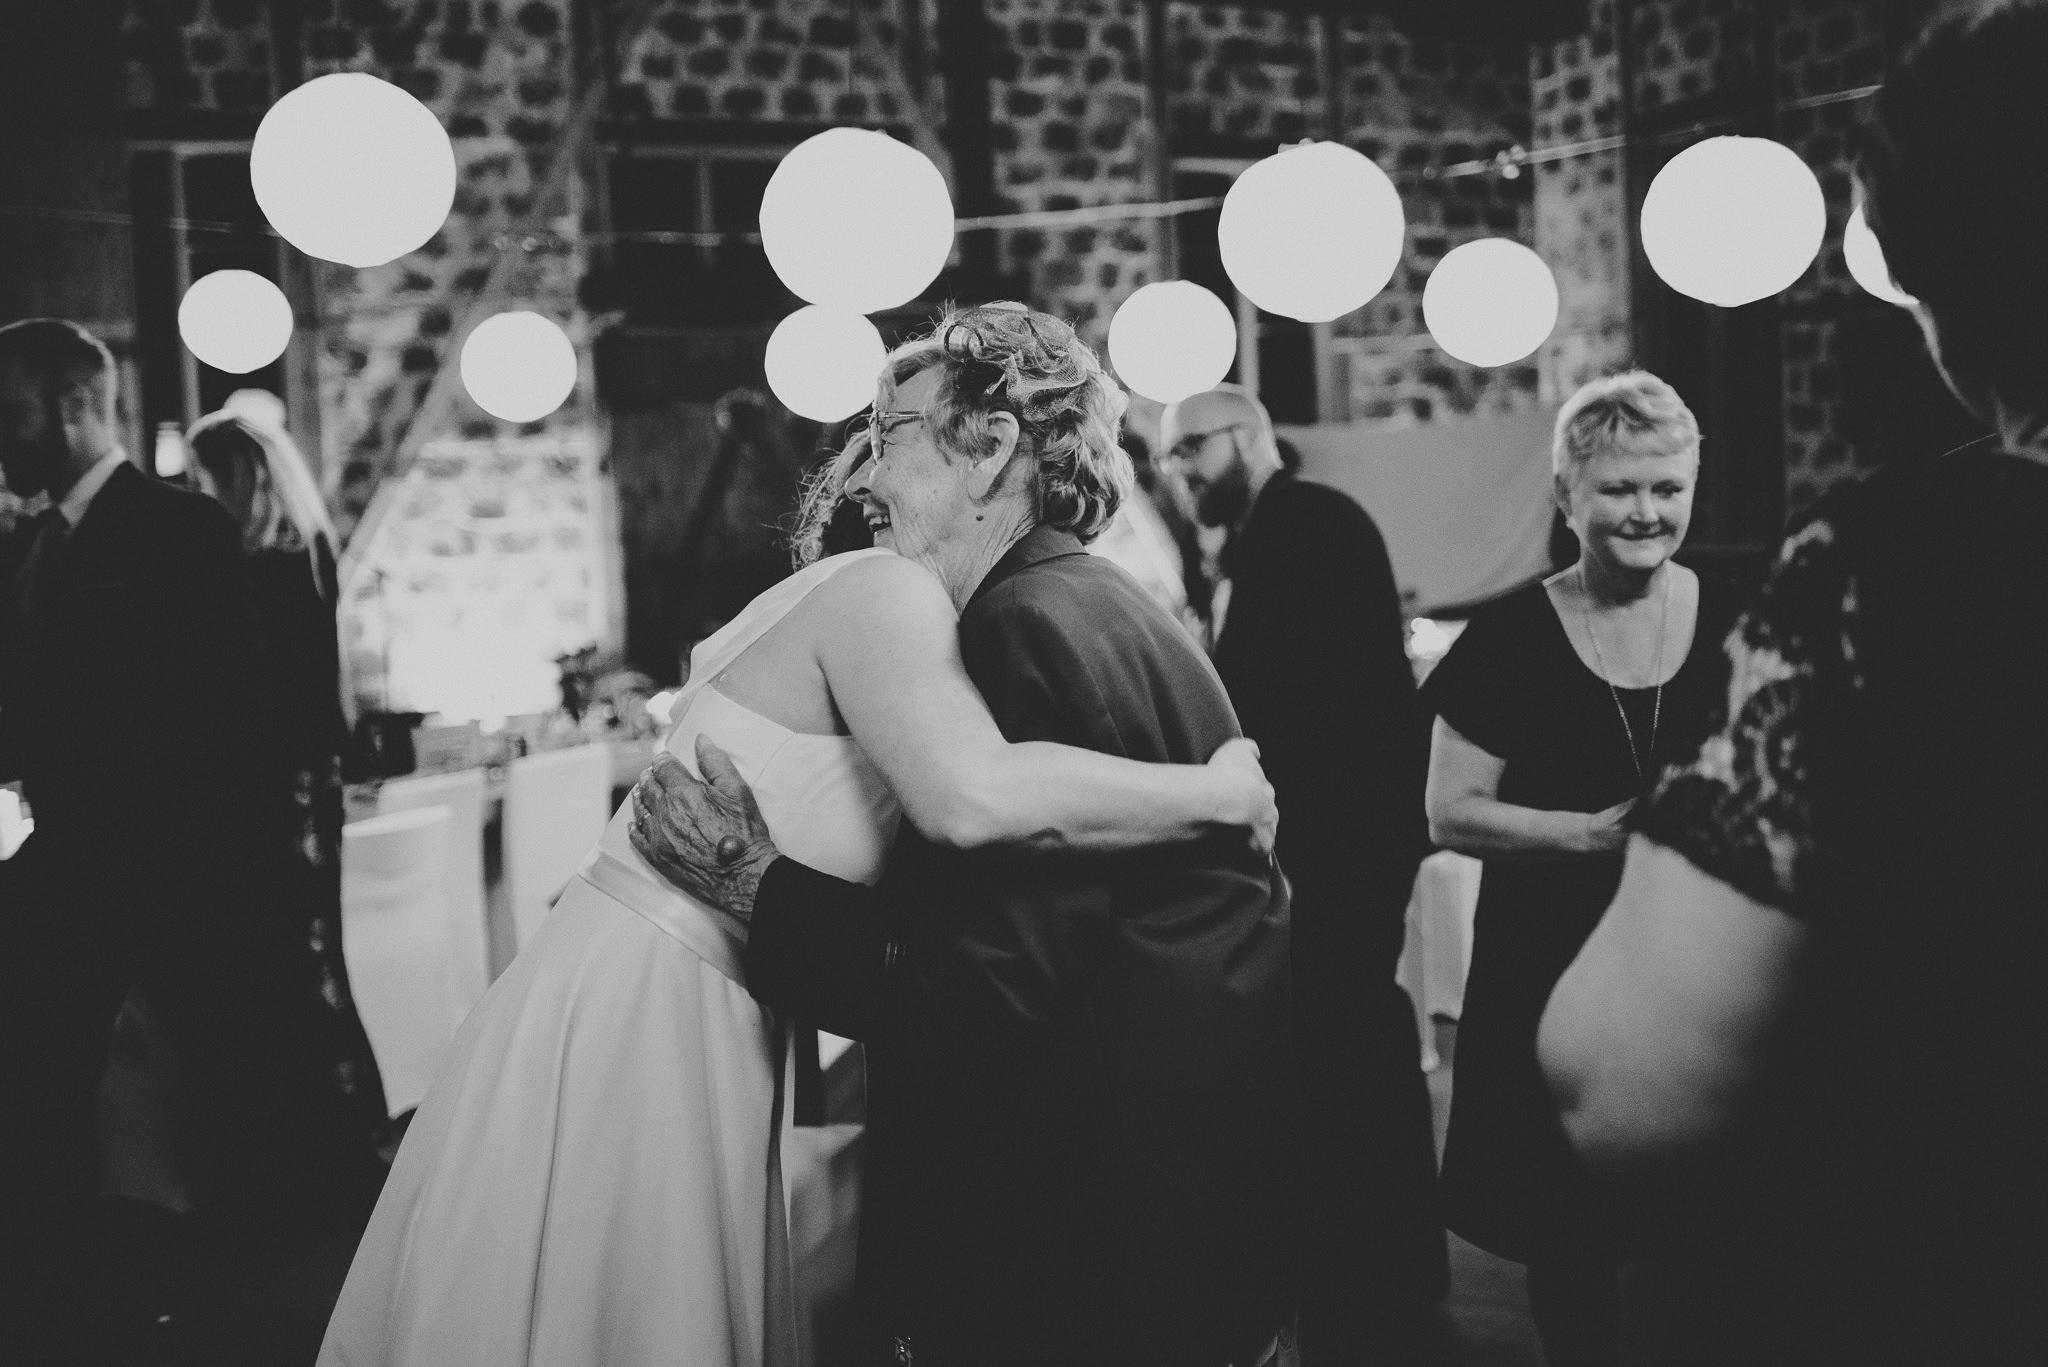 18-sweden-wedding-martarobin-5716.jpg